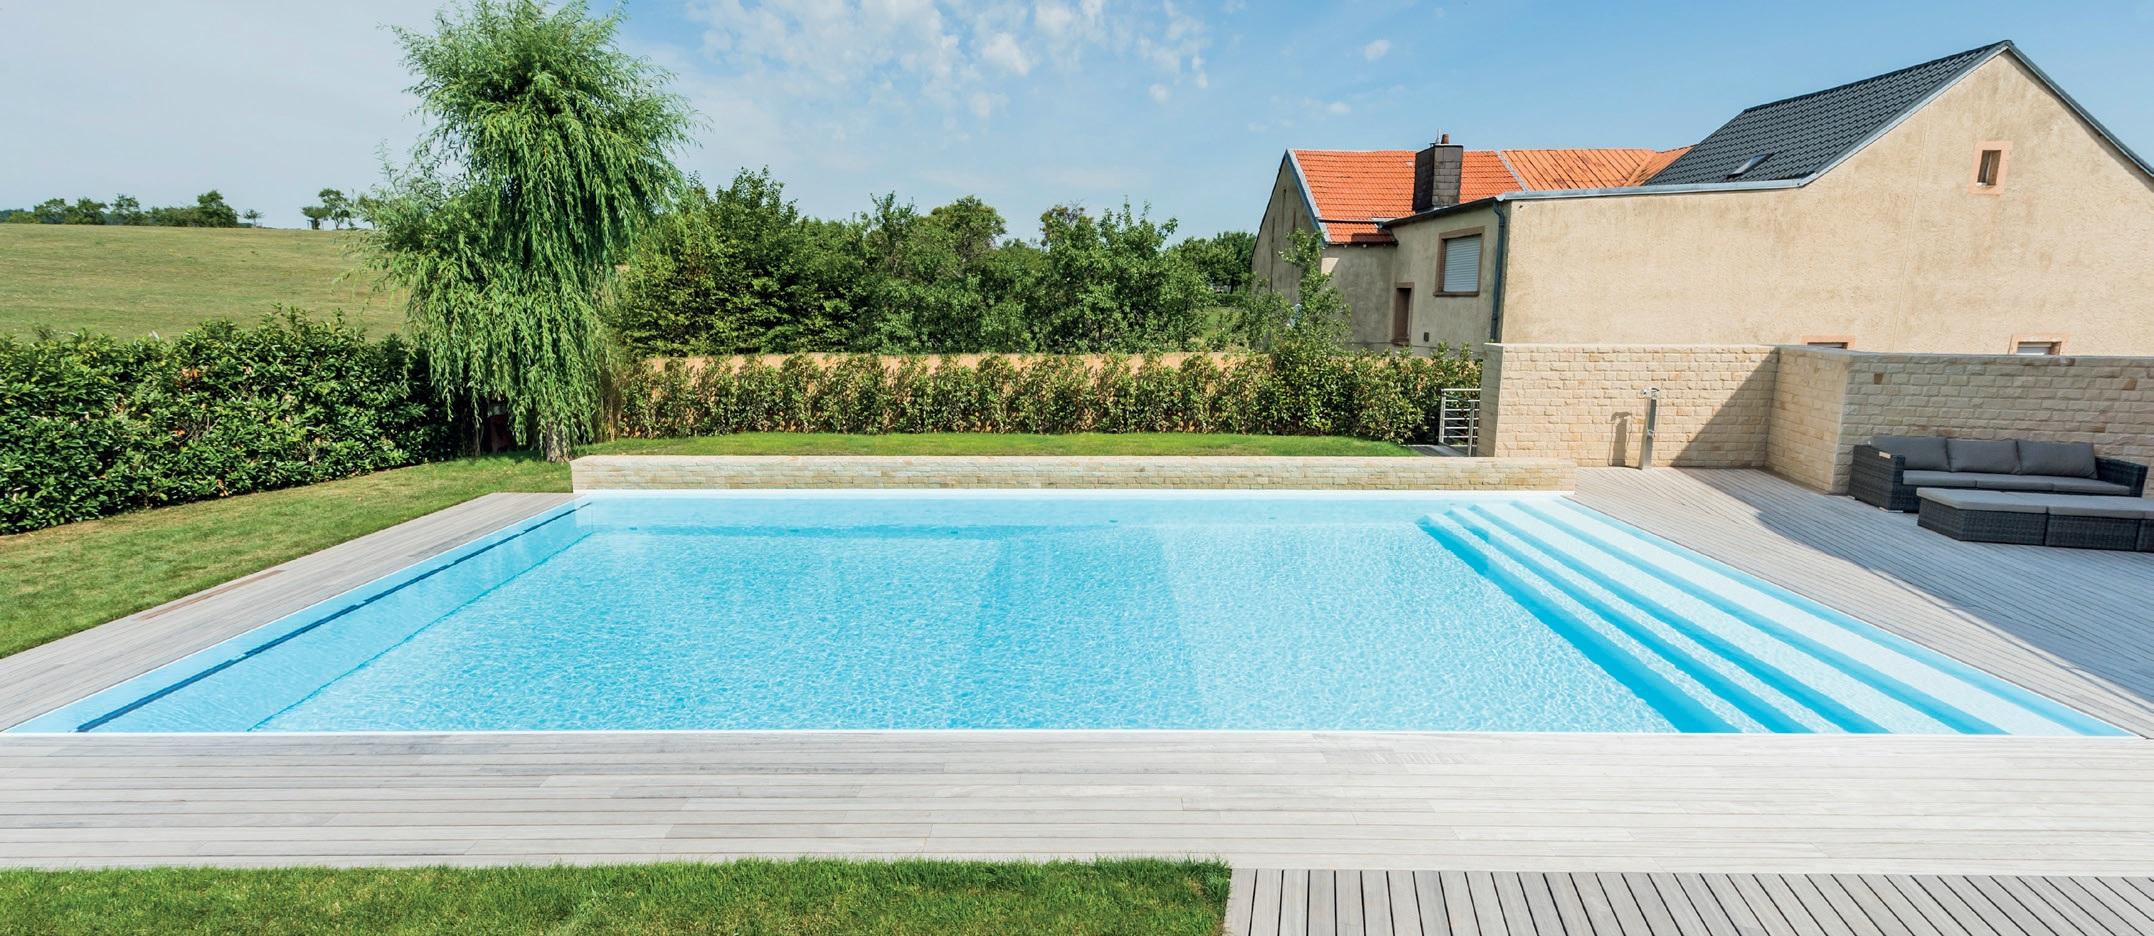 window on pool trends 1